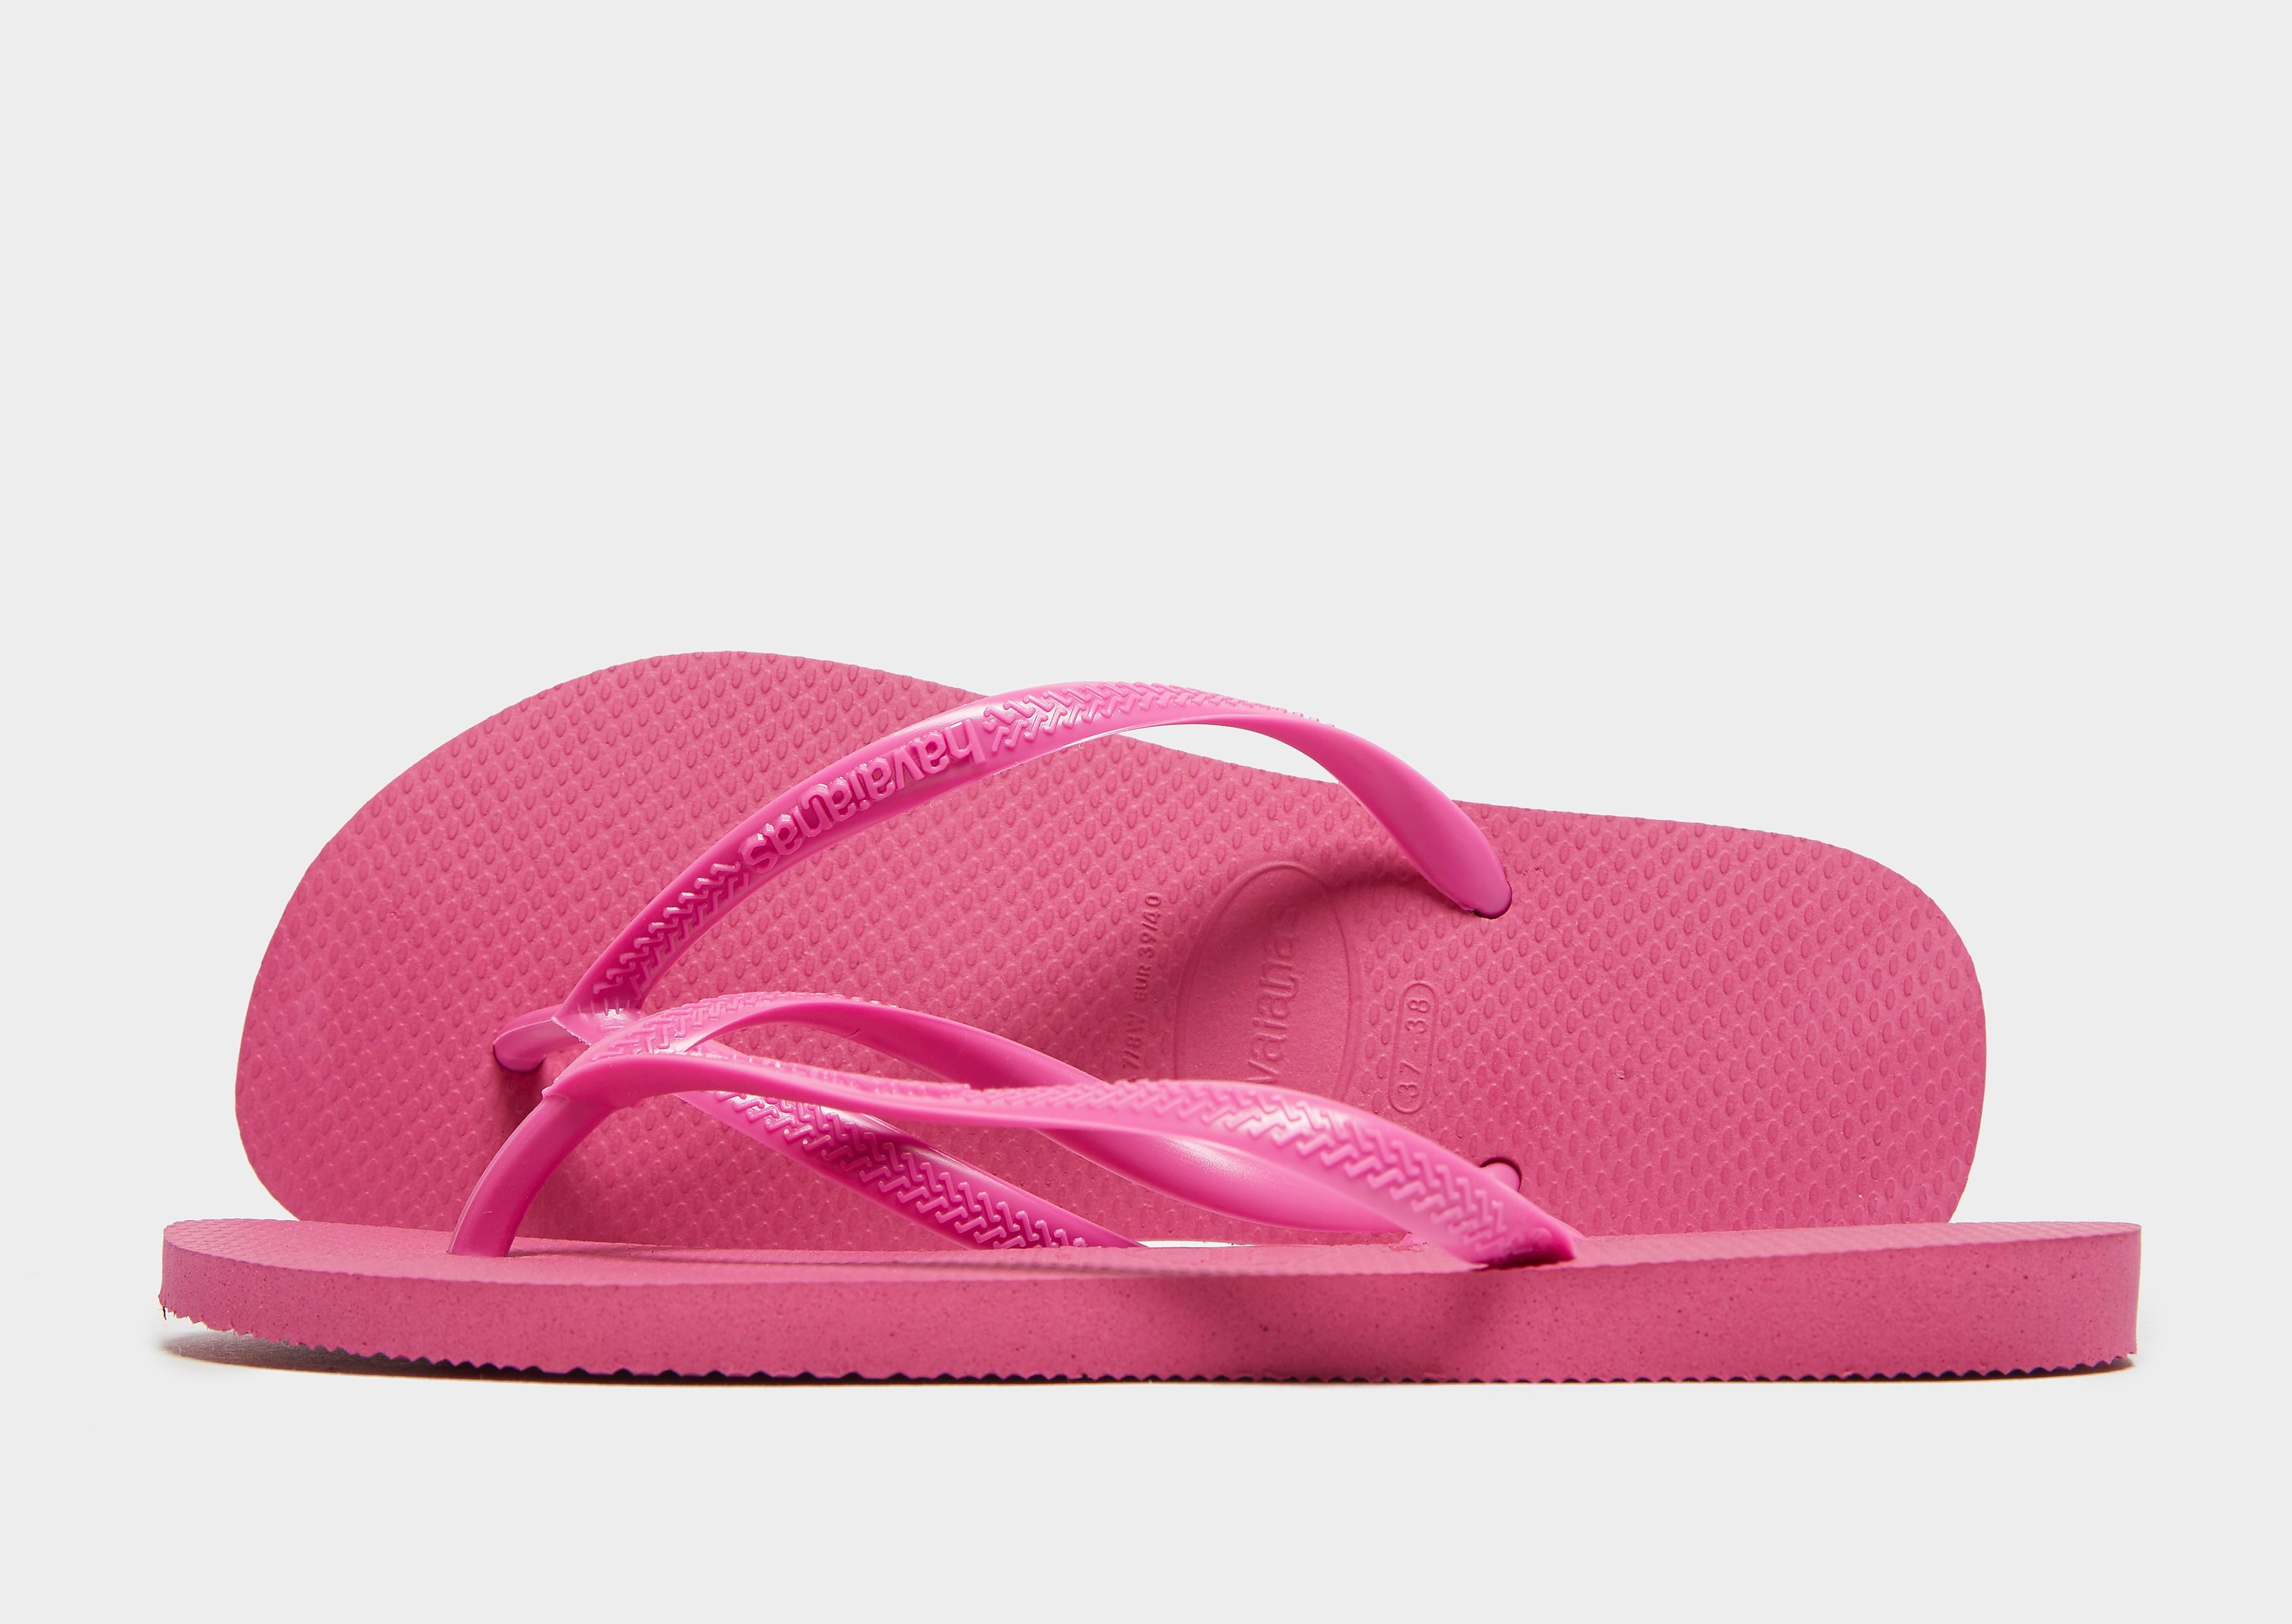 Havaianas Slim Flip Flops Dames - Roze - Dames